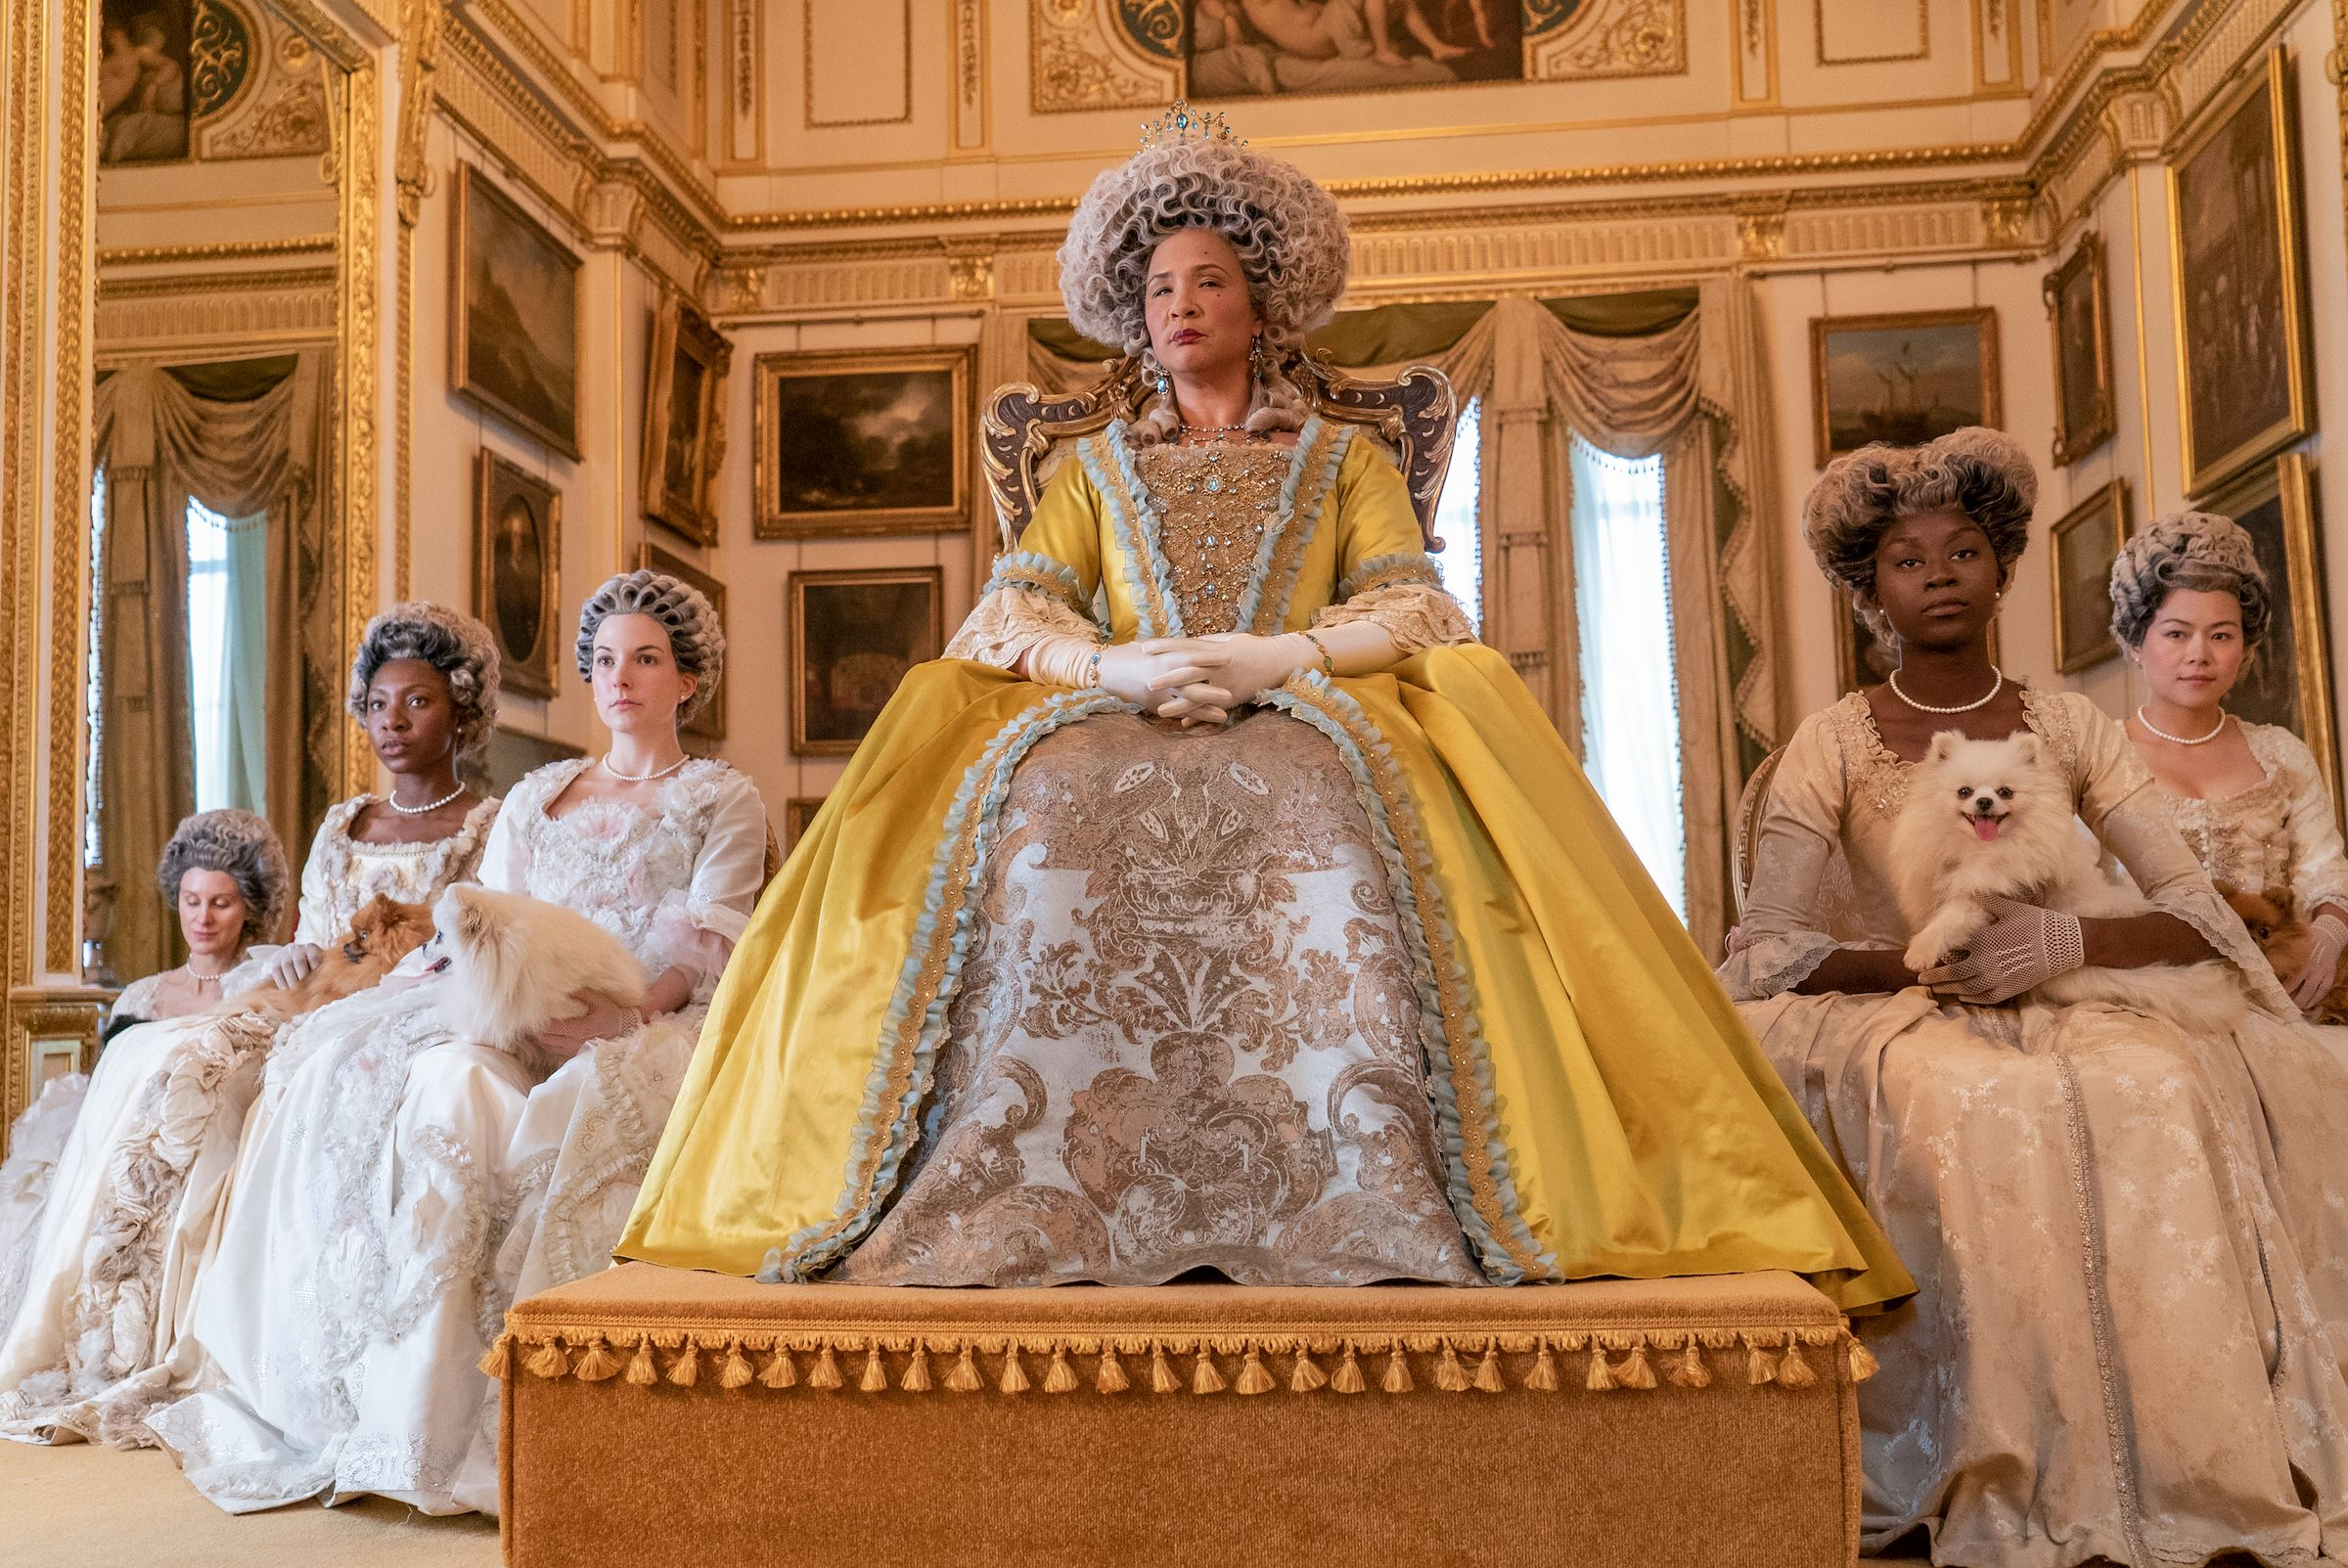 golda rosheuvel as queen charlotte in episode 105 of bridgerton